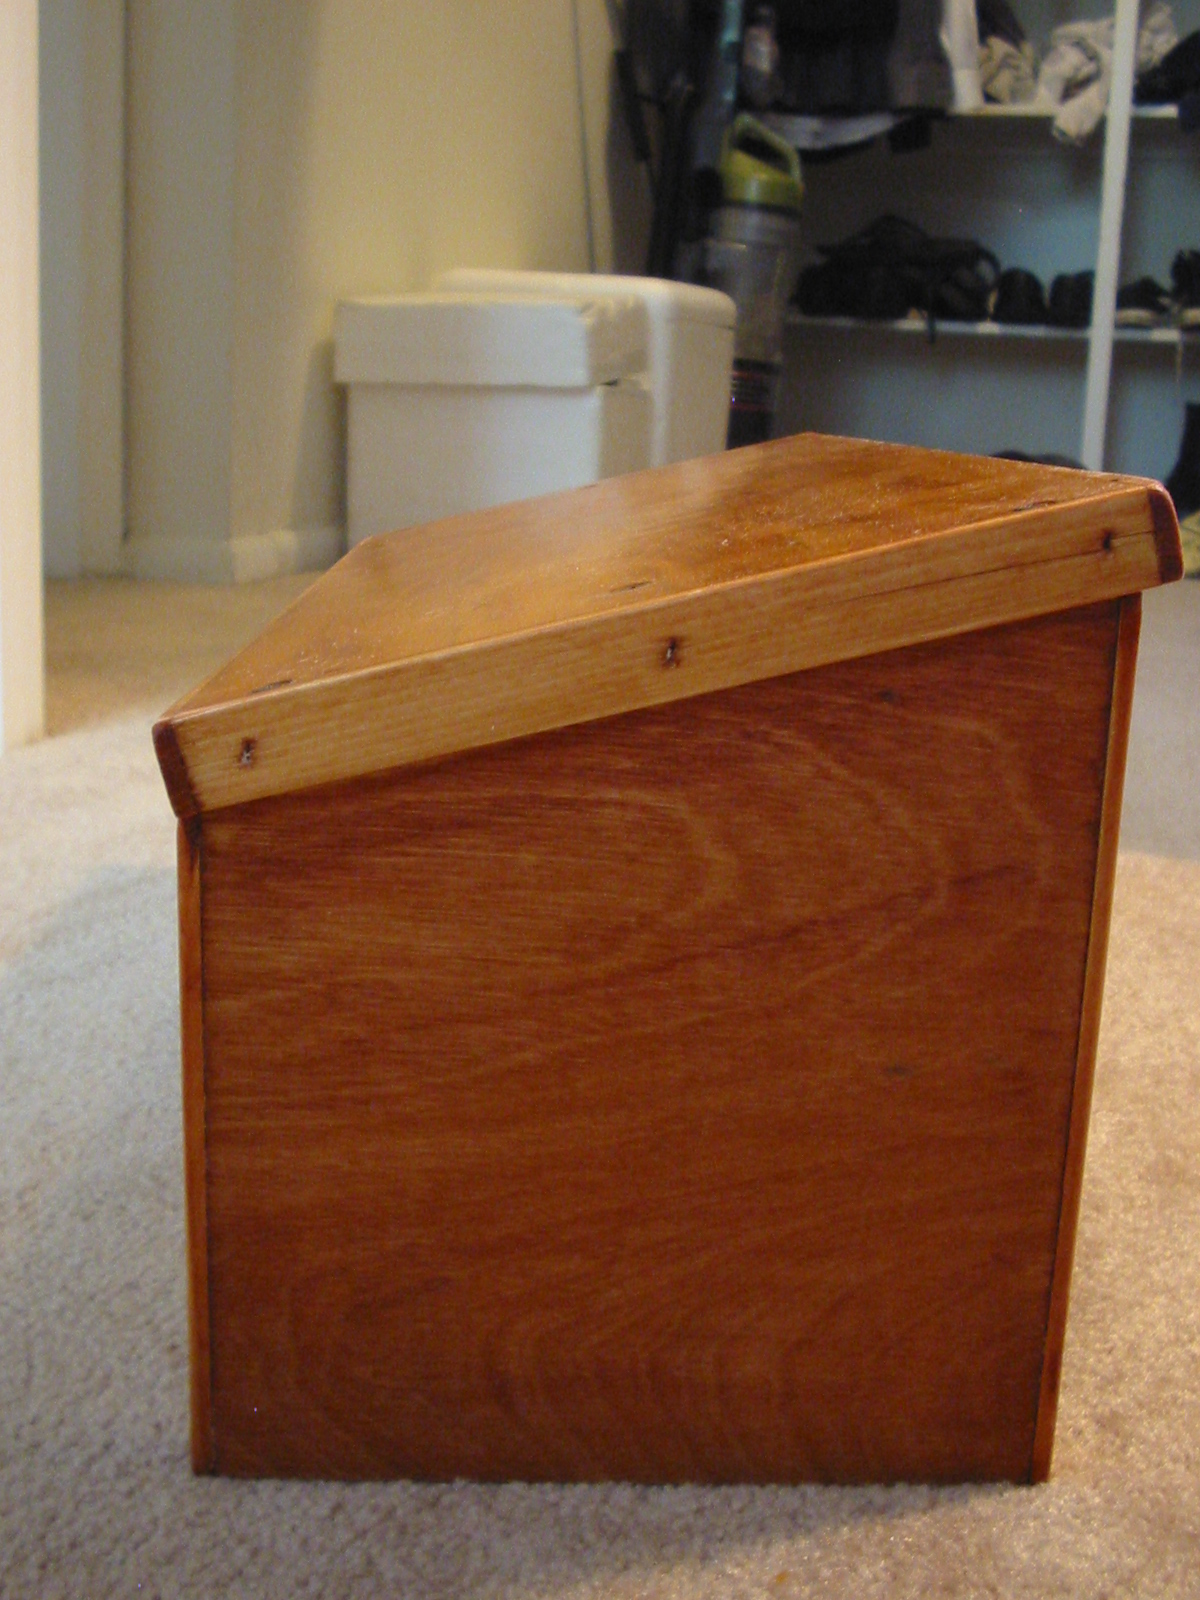 Folding Seiza Bench Plans Plans Diy How To Make